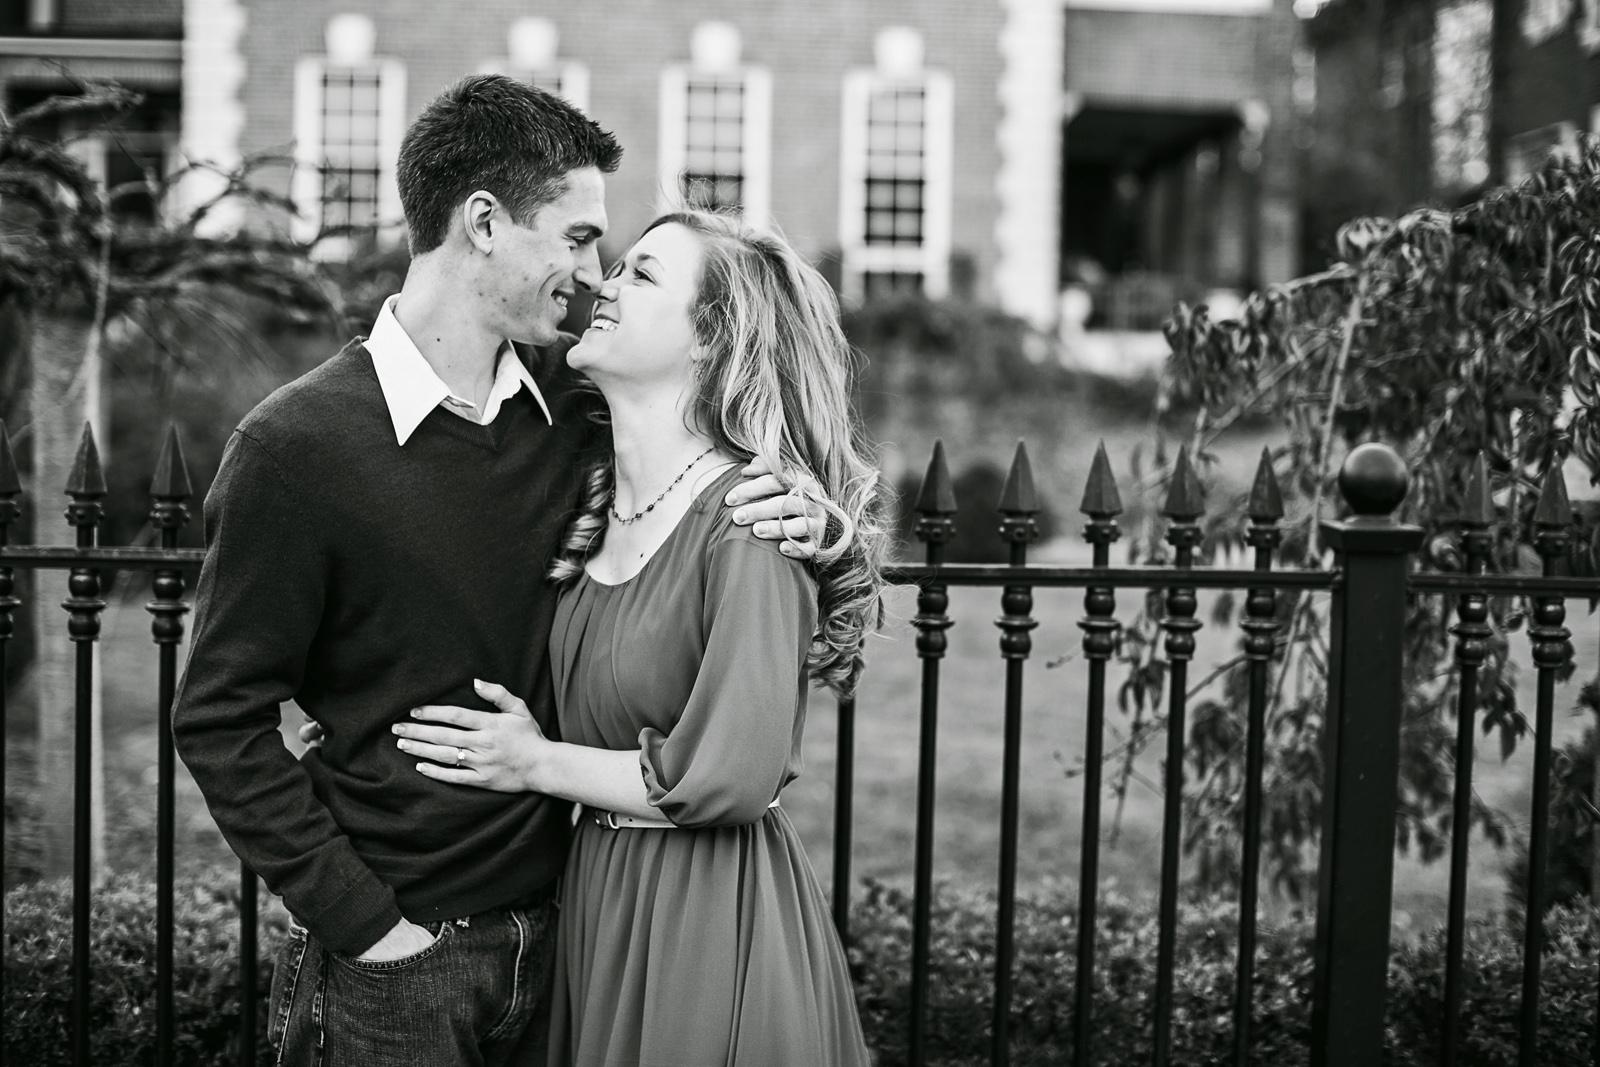 Oldani Photography-St Louis-CWE-Central West End-Engagement Session-engagement photos_20141108_161800-2.jpg